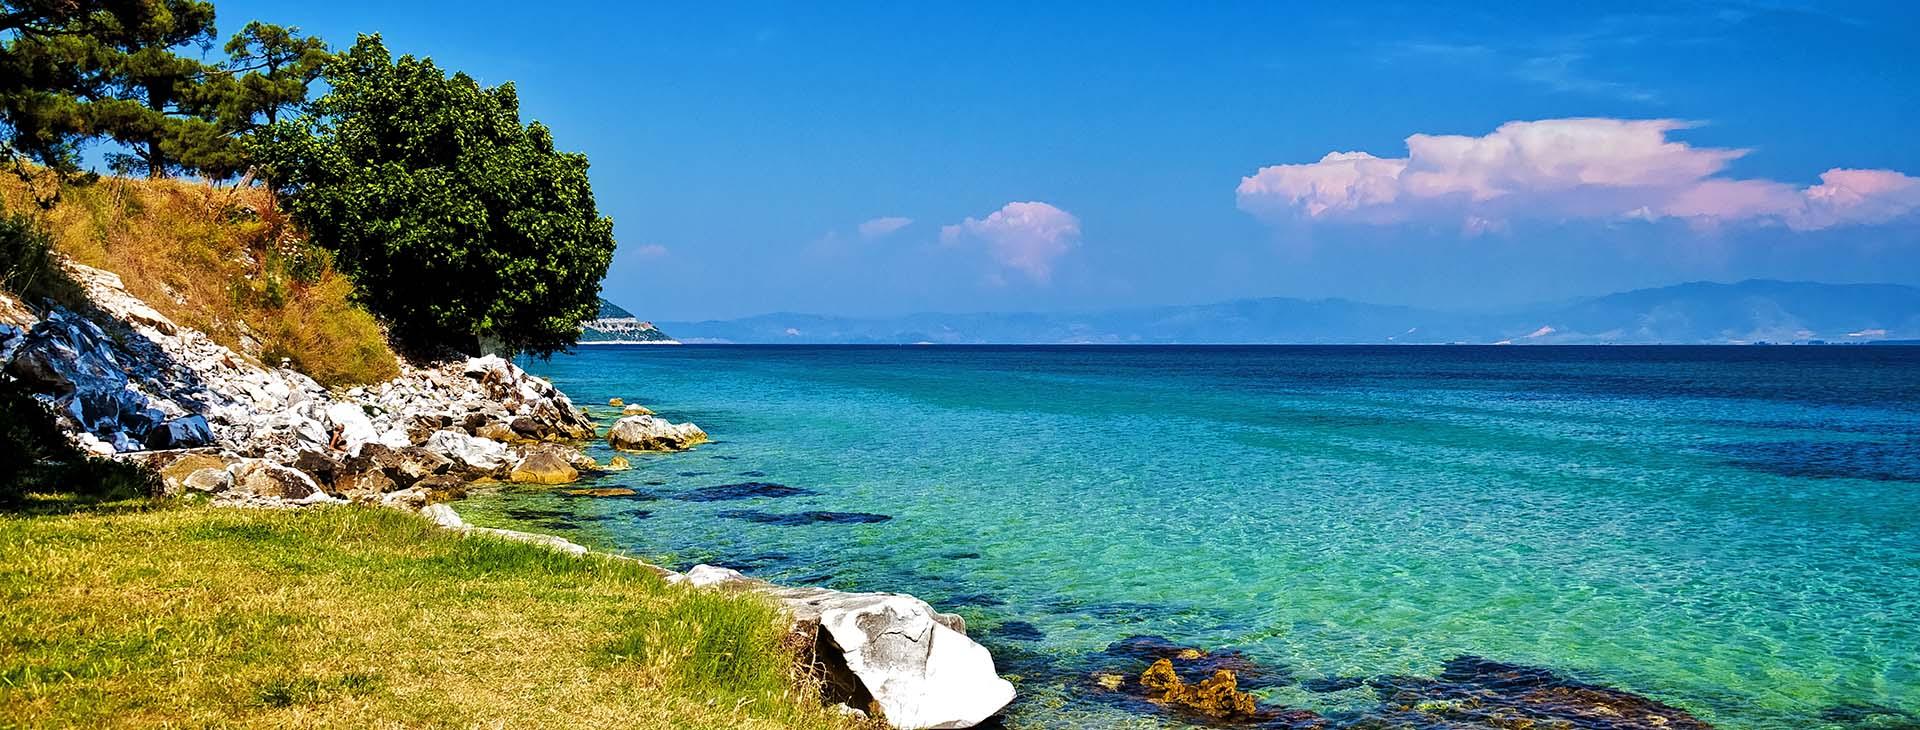 Beach at Thassos island